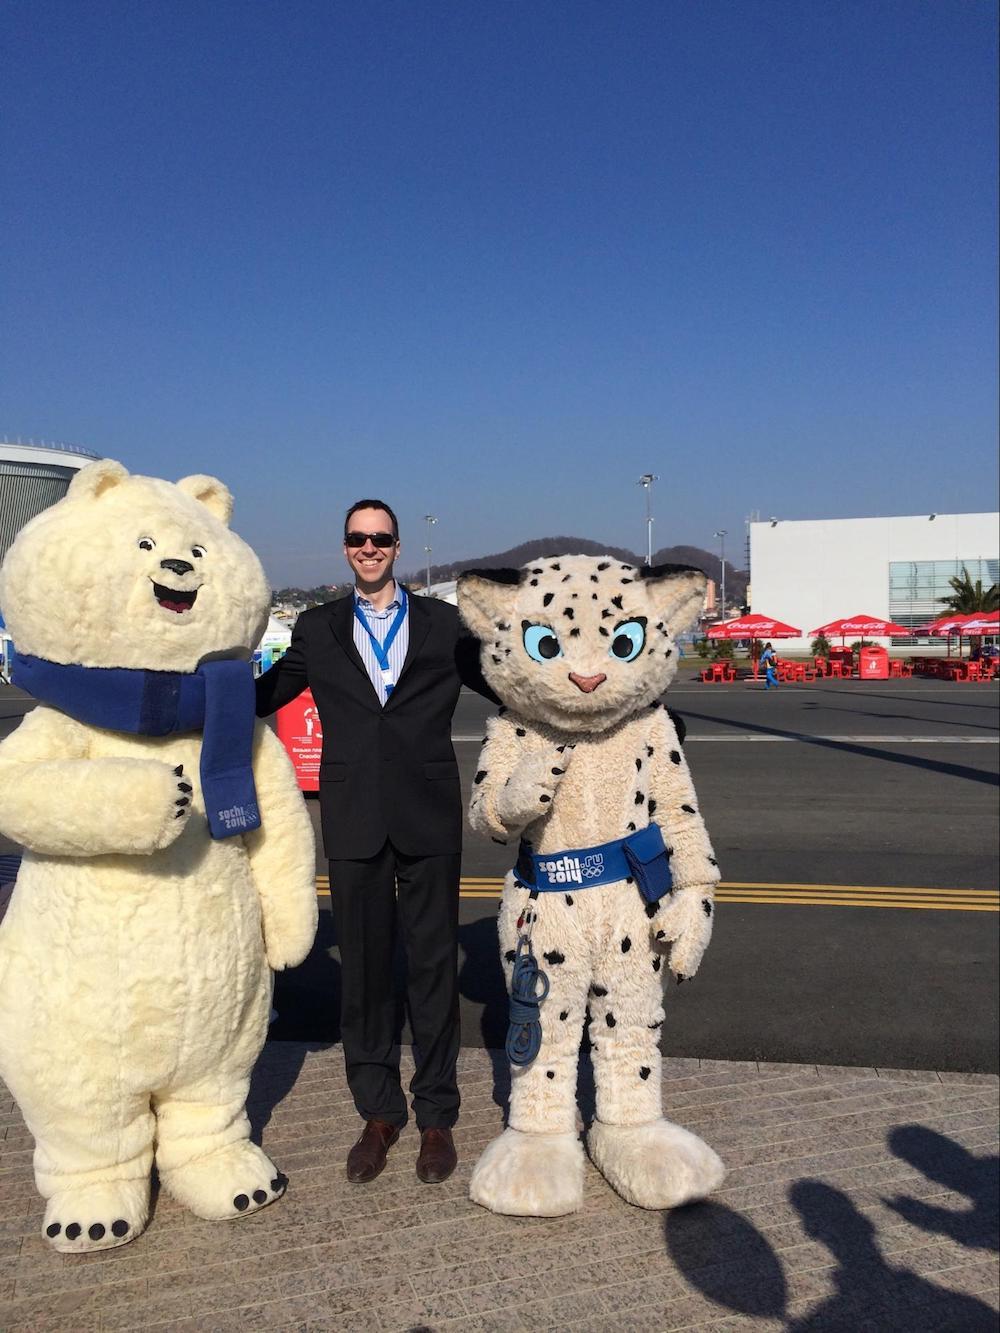 EMEA Managing Director, Richard Caelius, onsite at the 2014 Sochi Olympic Games.